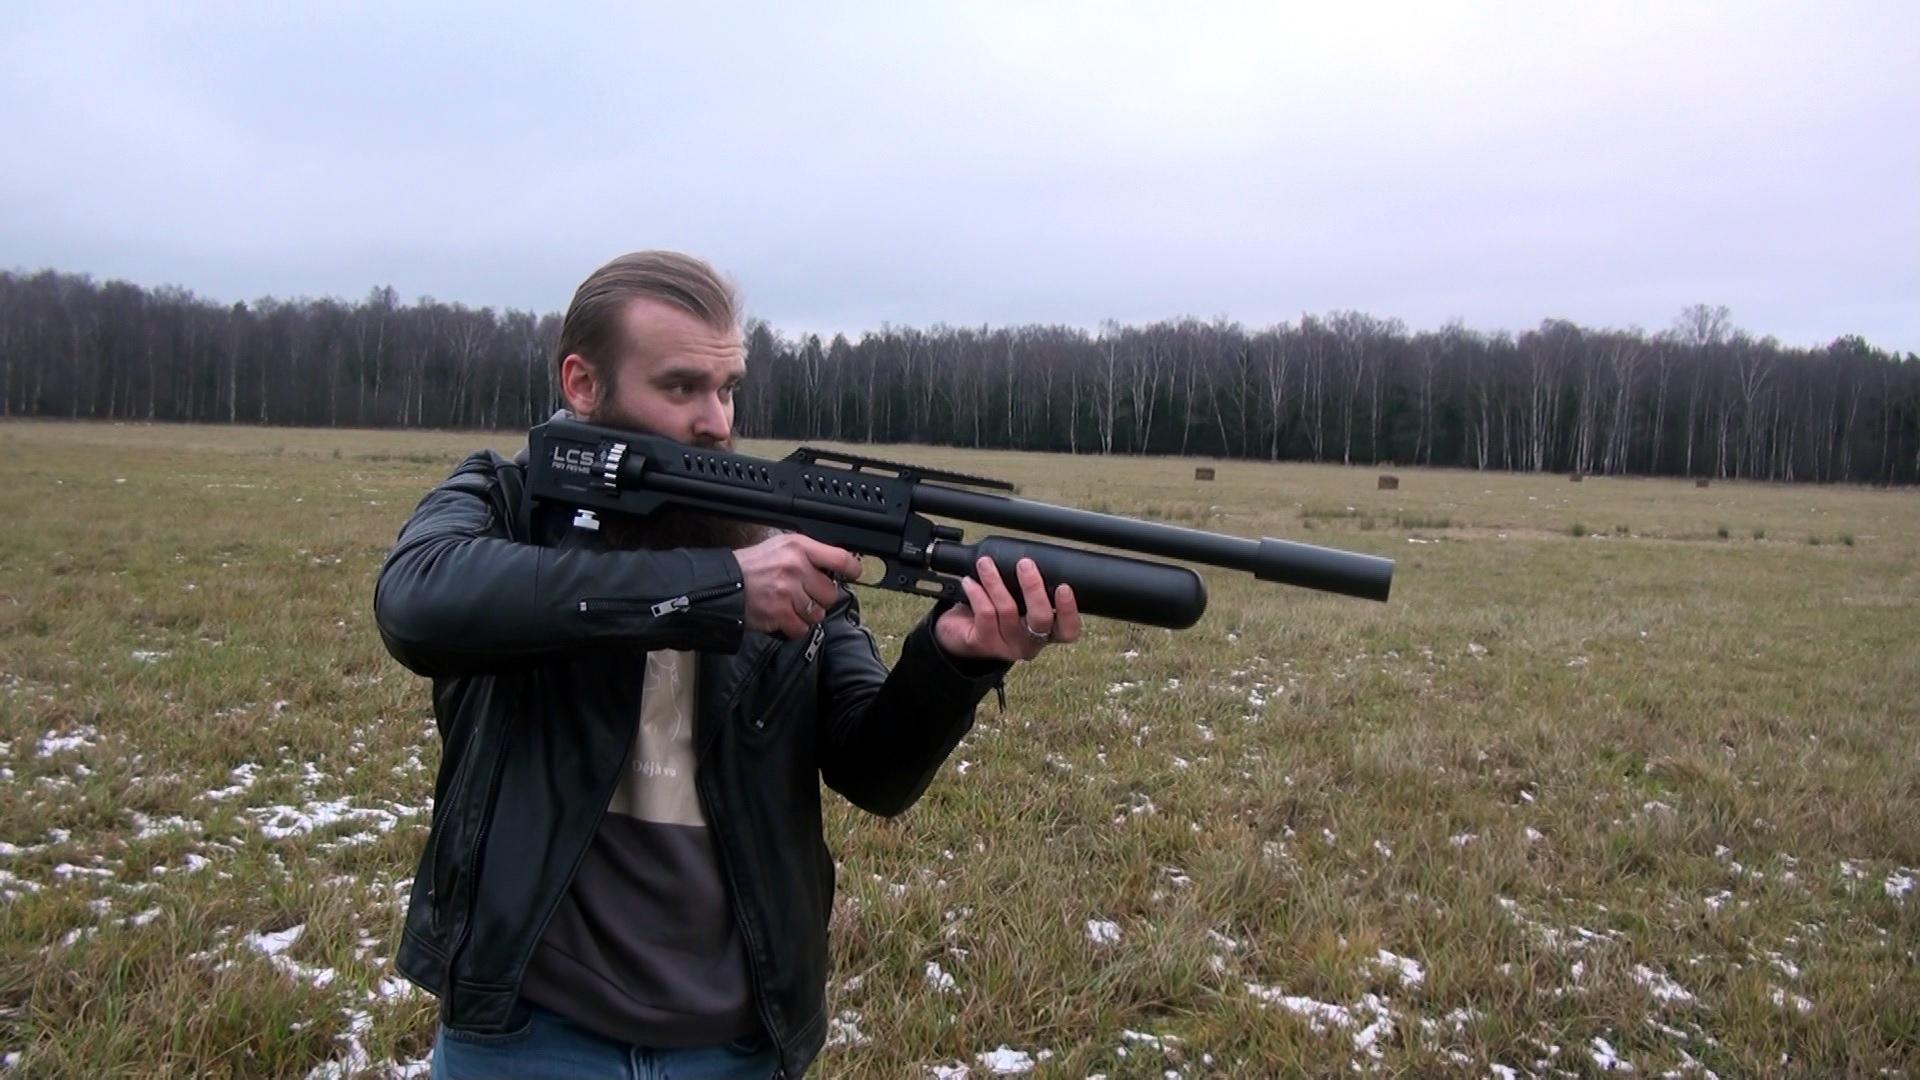 Air Arms SK19